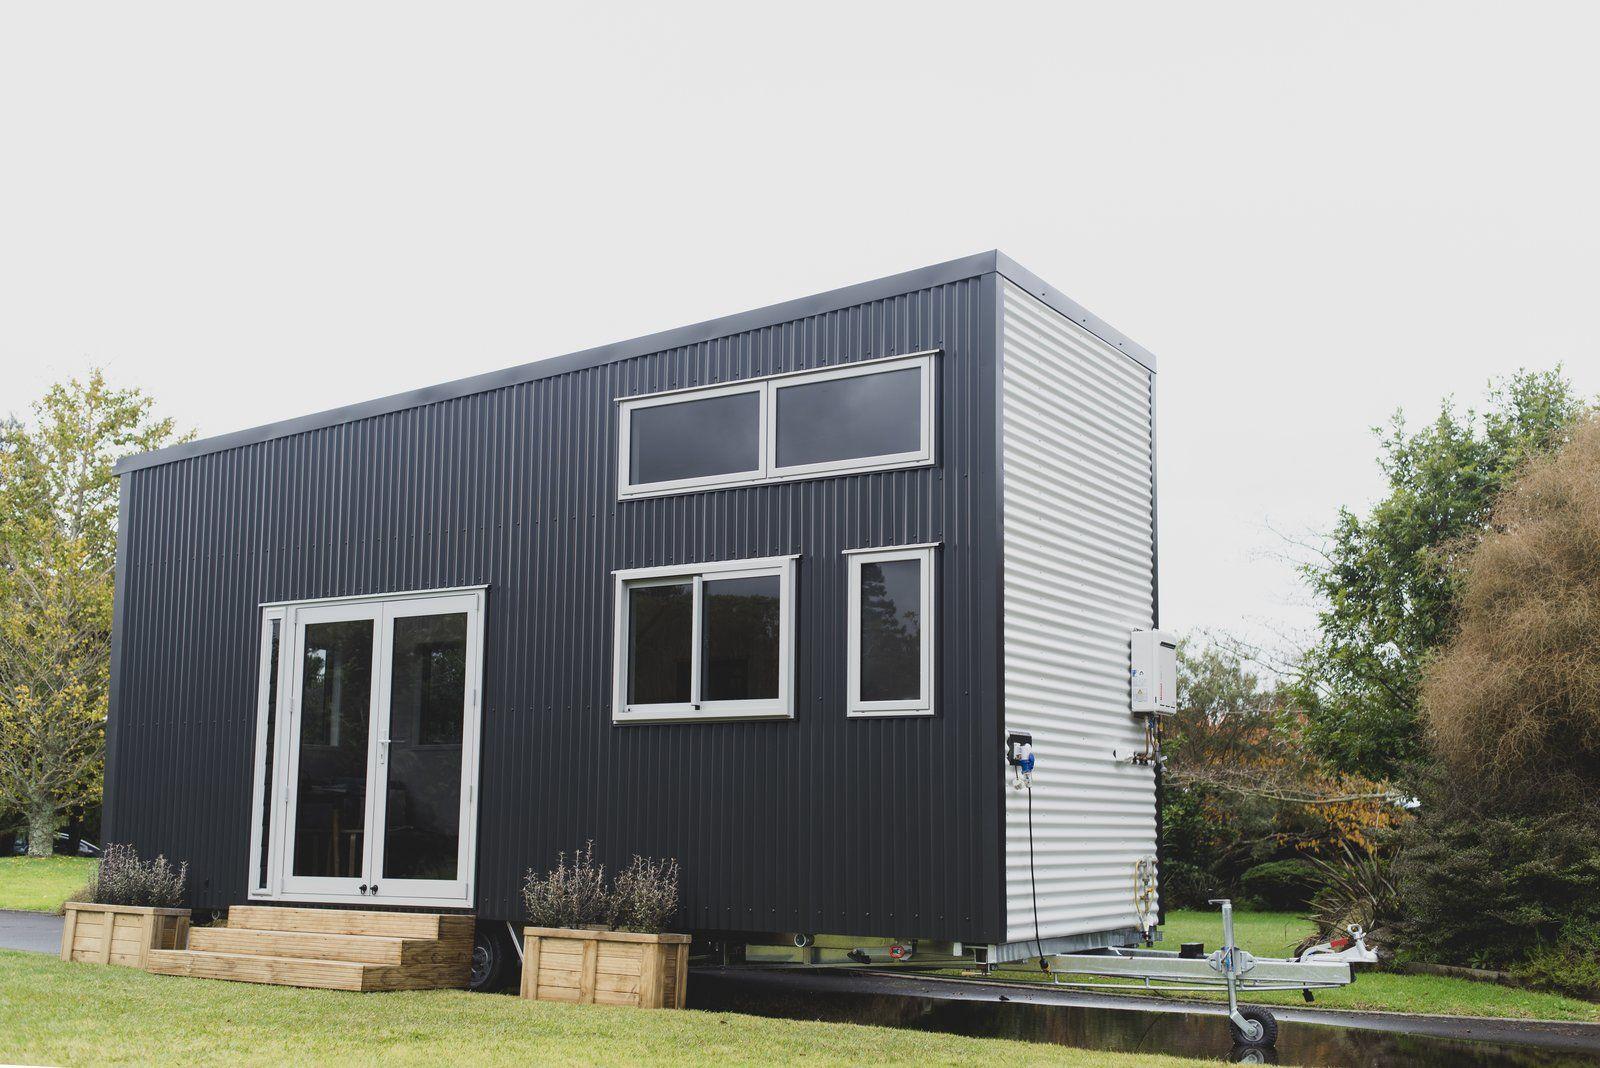 Exterior Material De Techo De Metal Material De Revestimiento De Metal Tipo De Construccion De Casa Peq Tiny House Exterior Corrugated Metal Roof Tiny House